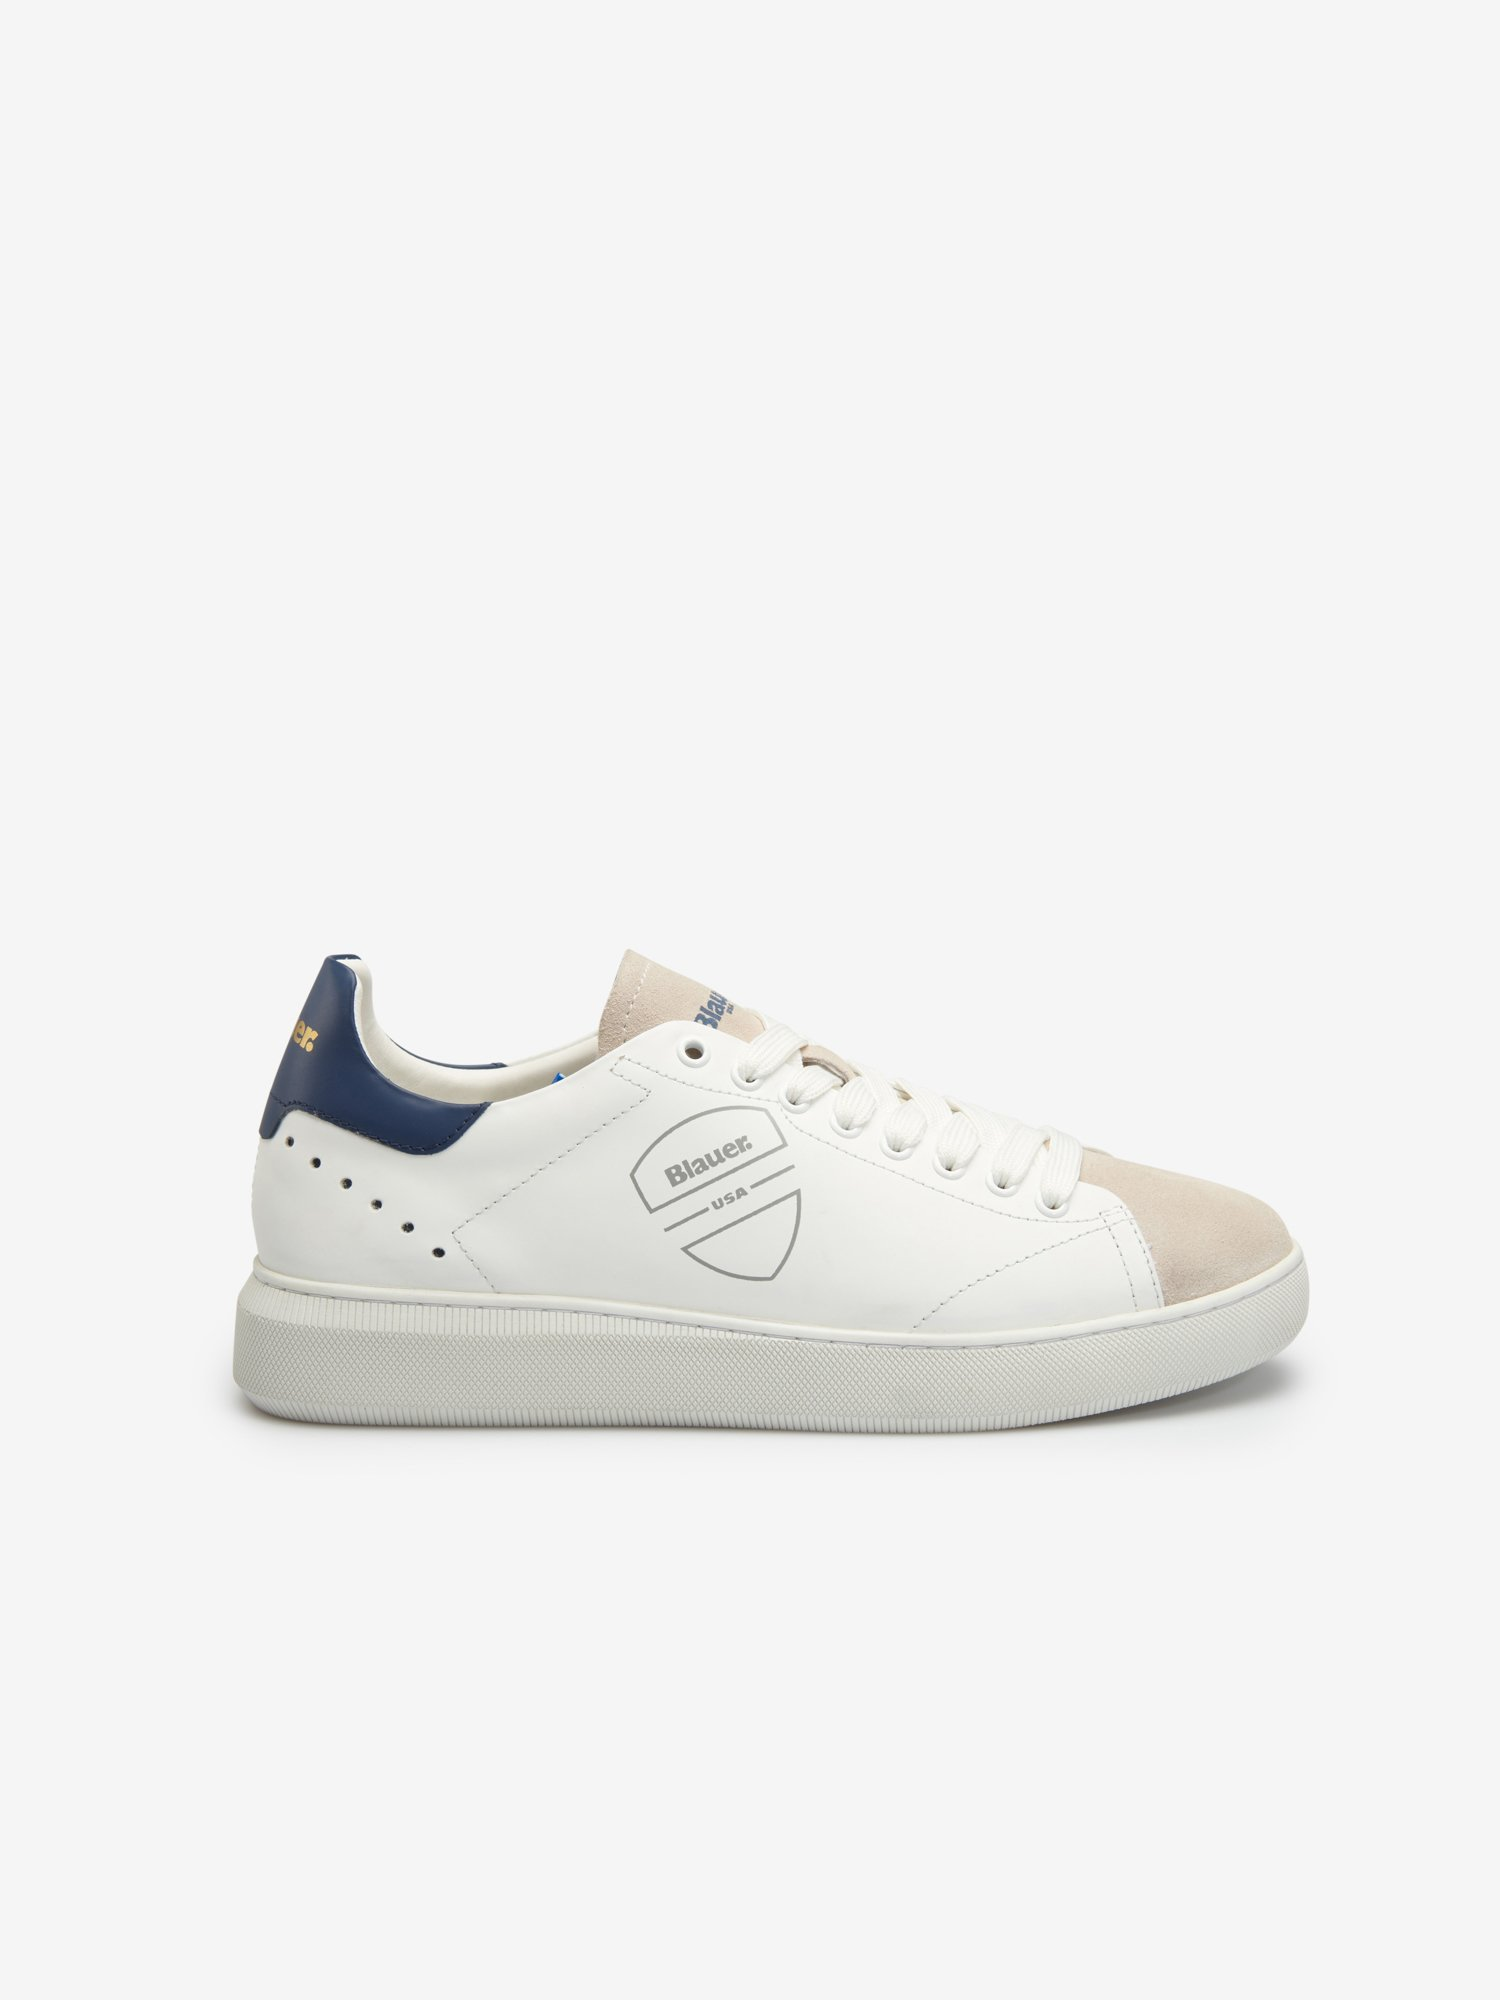 Blauer - Keith Leather Sneakers - Blu Ionio - Blauer